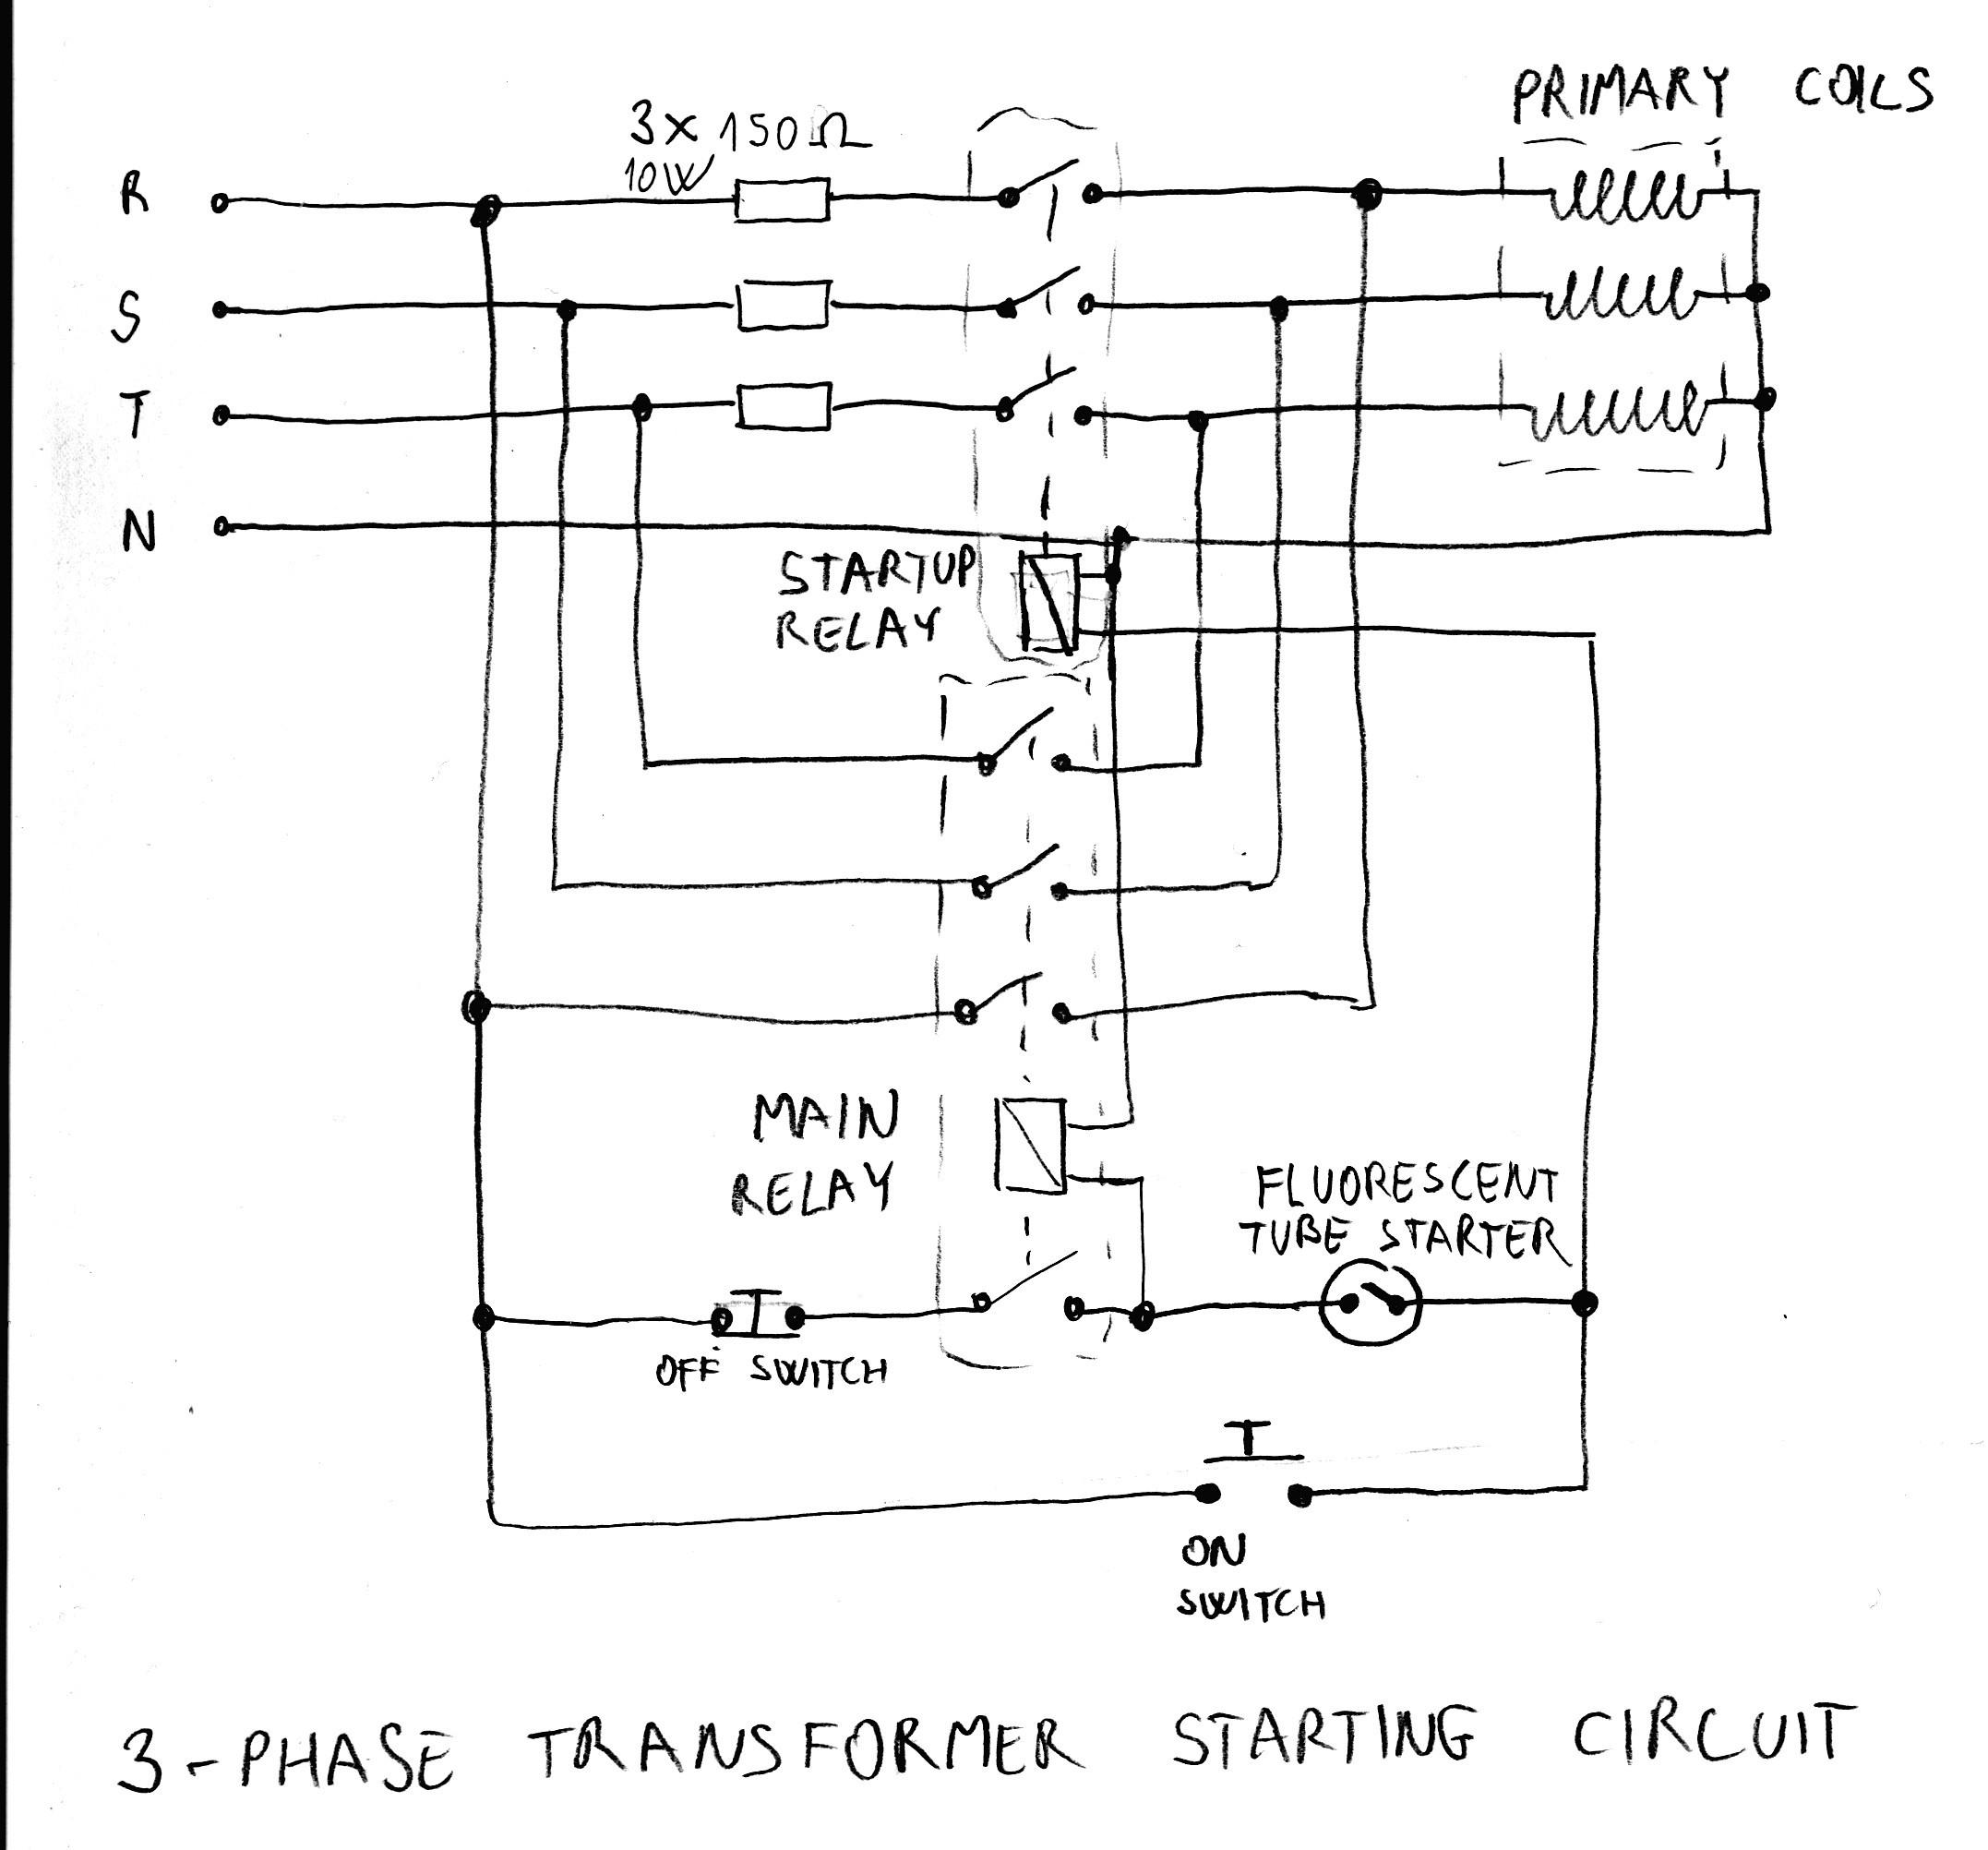 Hevi Duty Transformer Wiring Diagram   Free Wiring Diagram Ac Transformer Wiring Diagram on